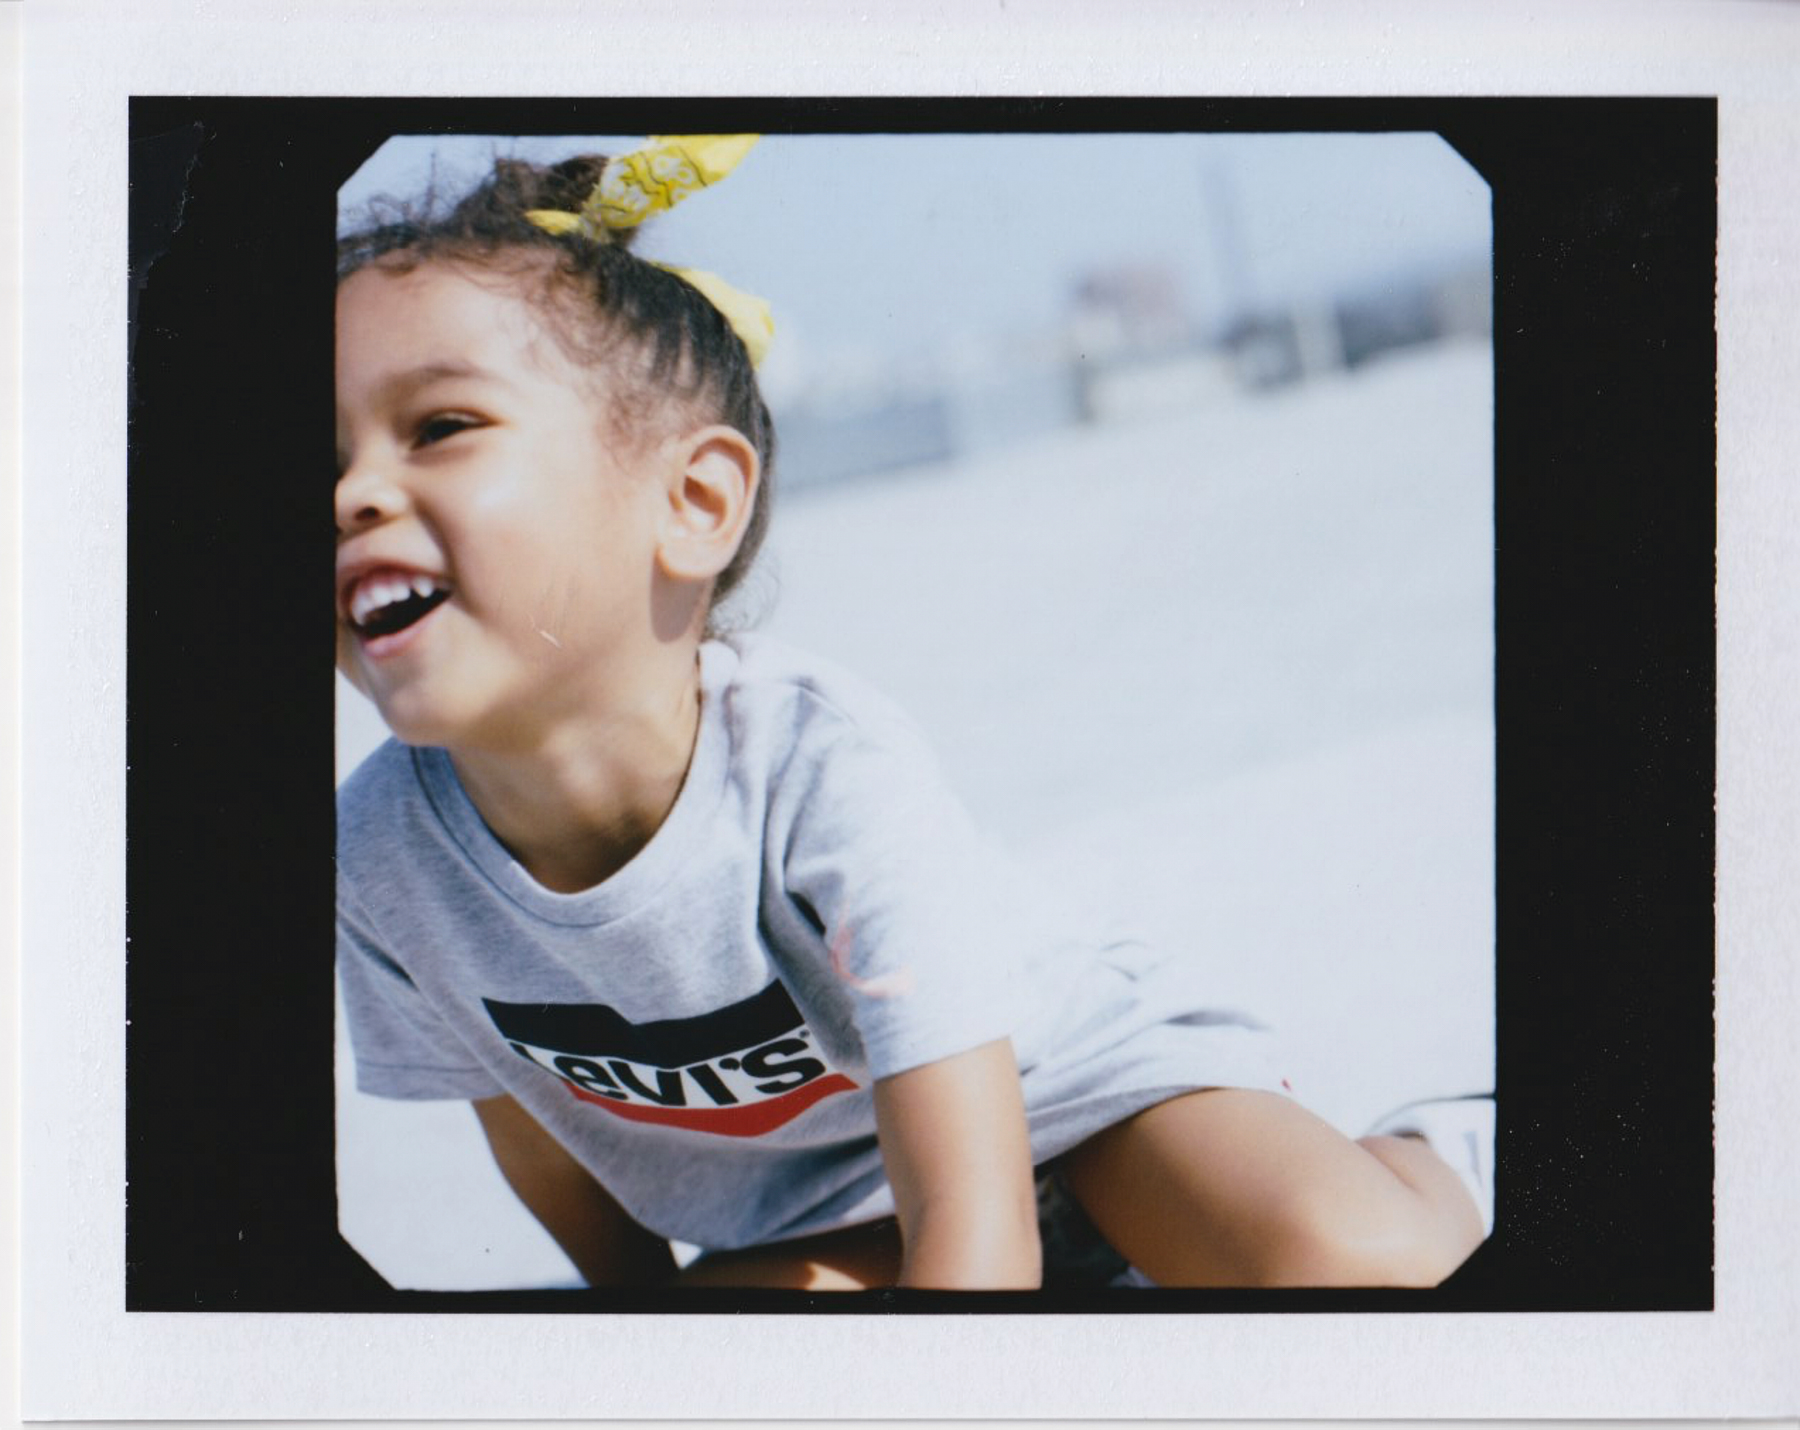 01_19_H1_Kids_Kidiliz_KnitDress_3yr_G_polaroid2.jpg